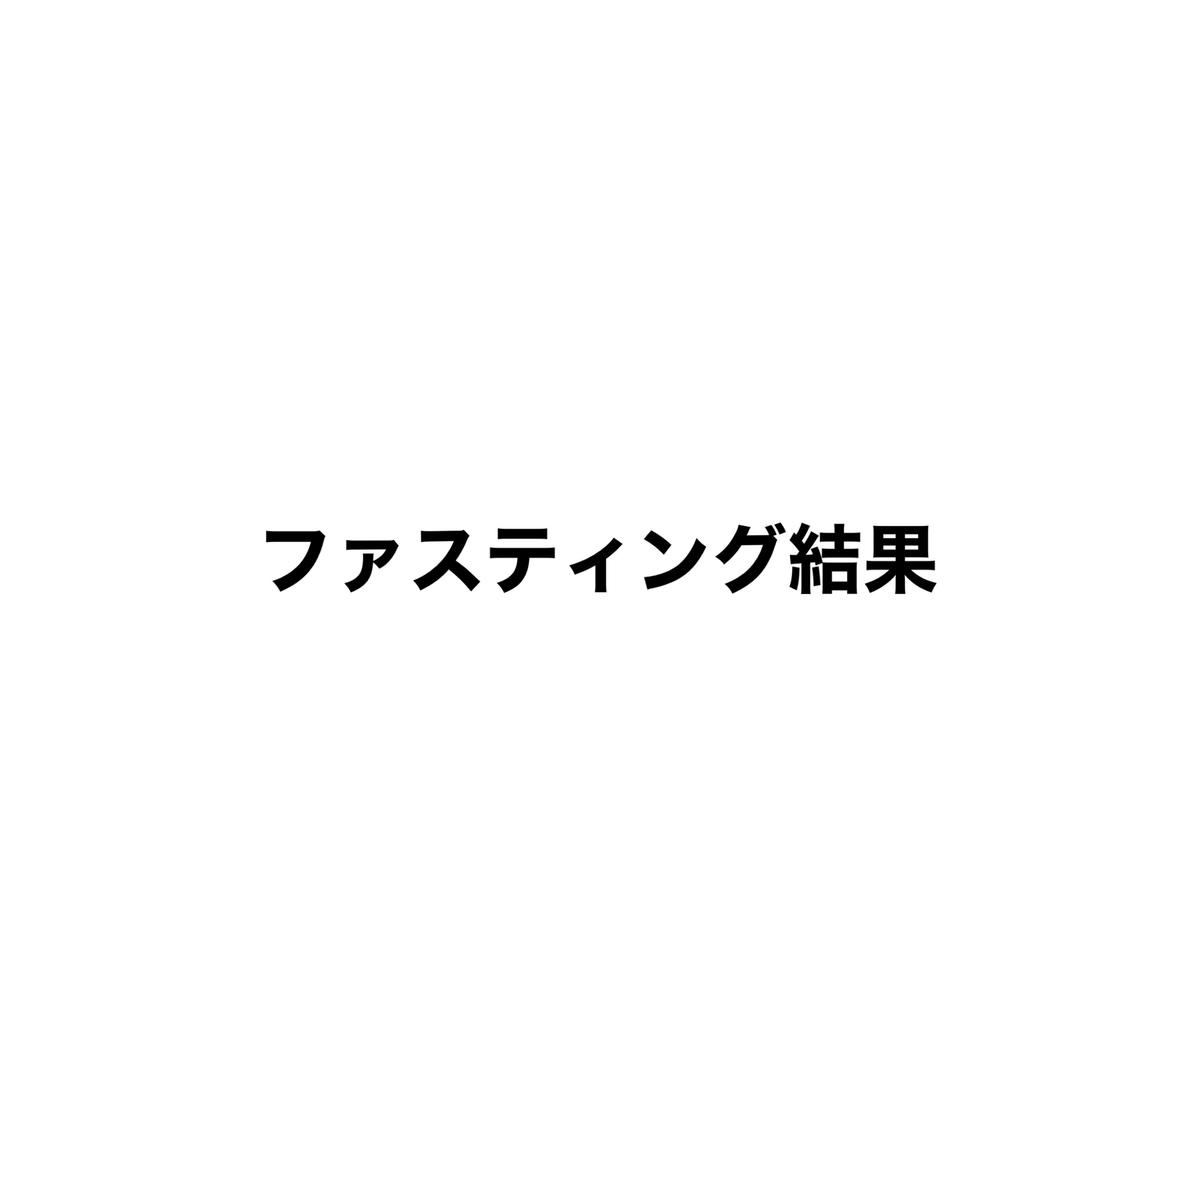 f:id:mahalohaokinawa:20200906101848j:plain